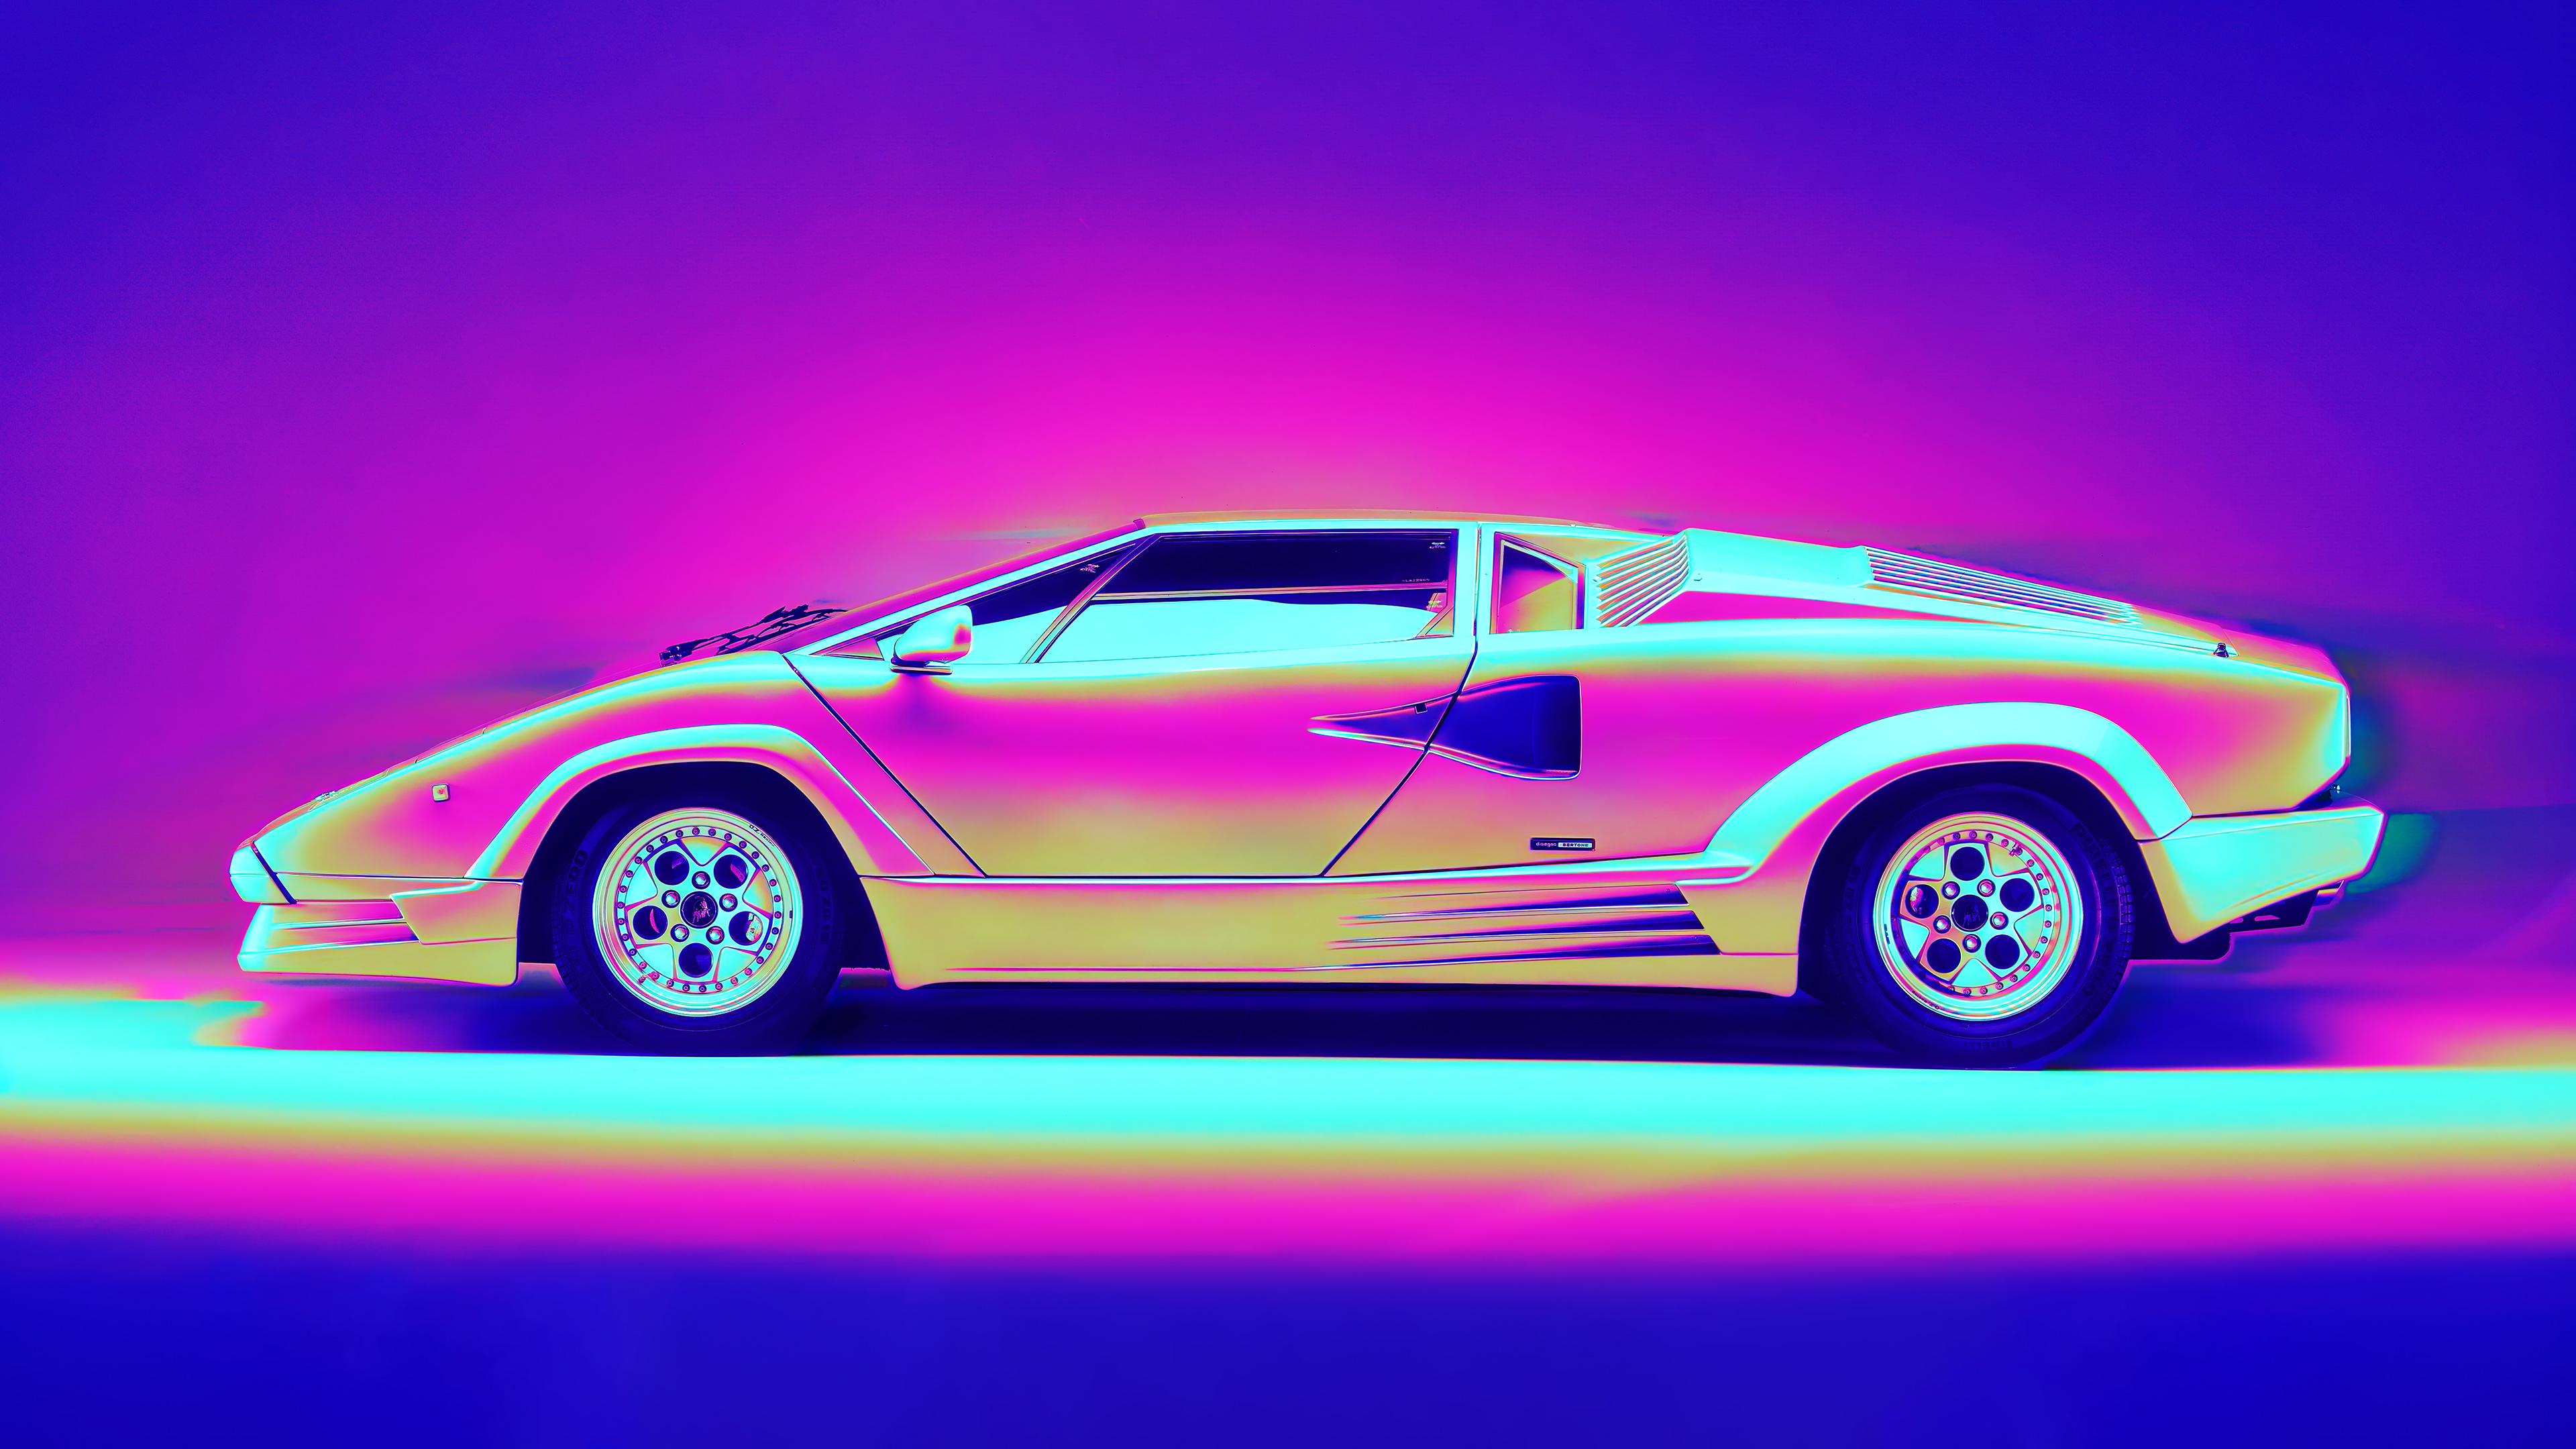 Lamborghini Countach Retro Artwork 4k Hd Cars 4k Wallpapers